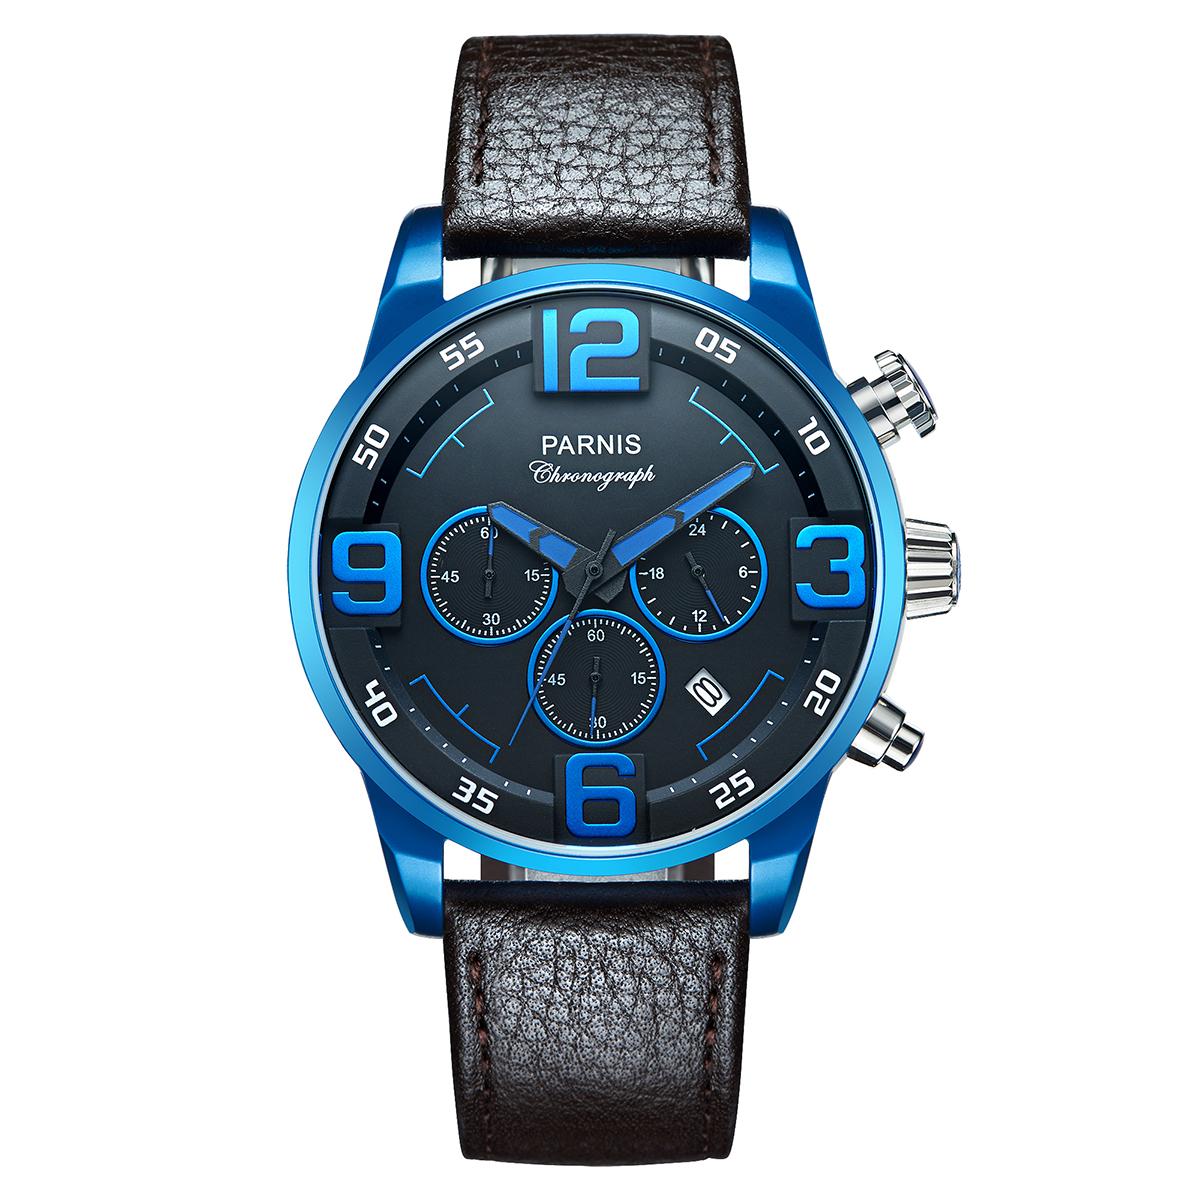 PARNIS标准打数青漆石英手表[P6033-S6EL-BLBK]并进进口商品纯正情况厂商保证12个月